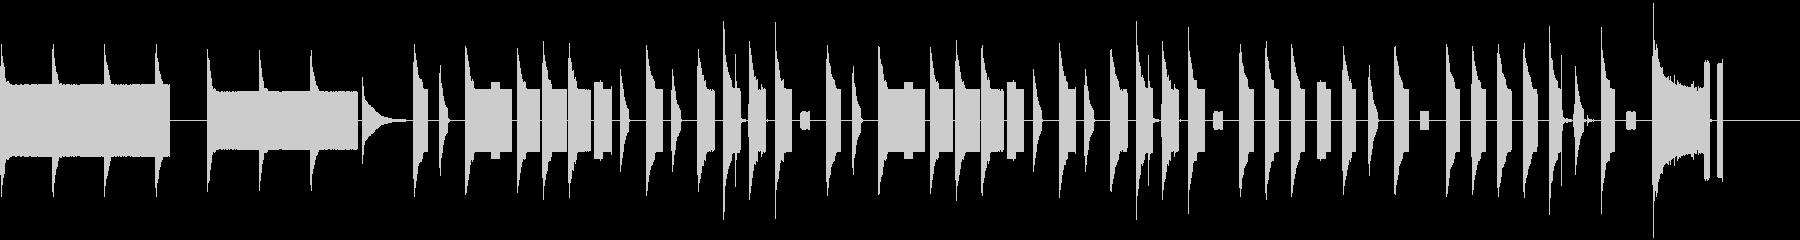 KANT8bit15秒コミカルBGMの未再生の波形